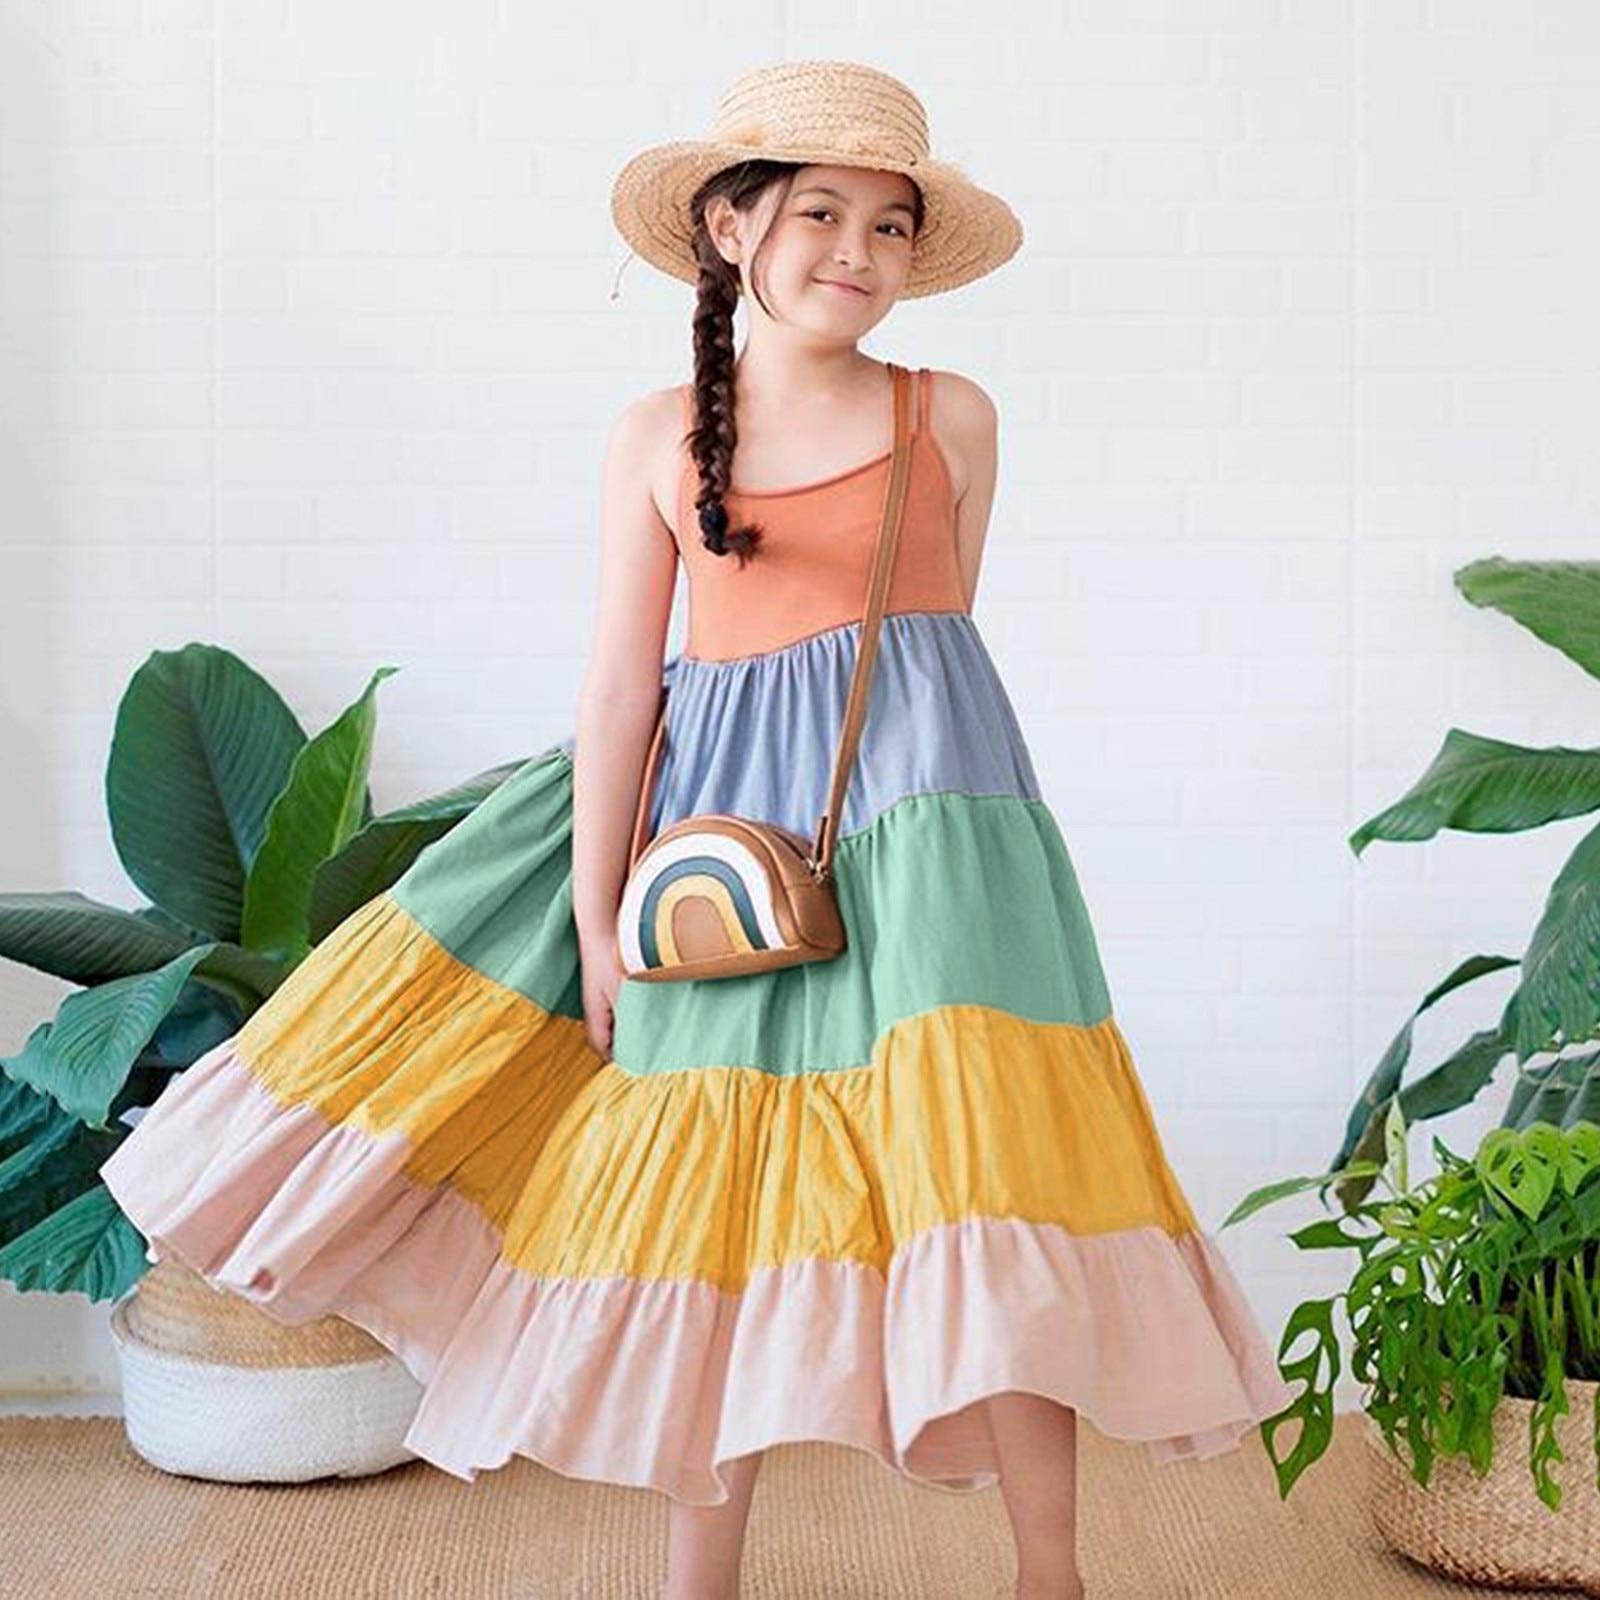 #50 Toddler Baby Girls Sleeveless Rainbow Beach Suspender Dress Princess Dresses Autumn Newborn Infant Baby Dress